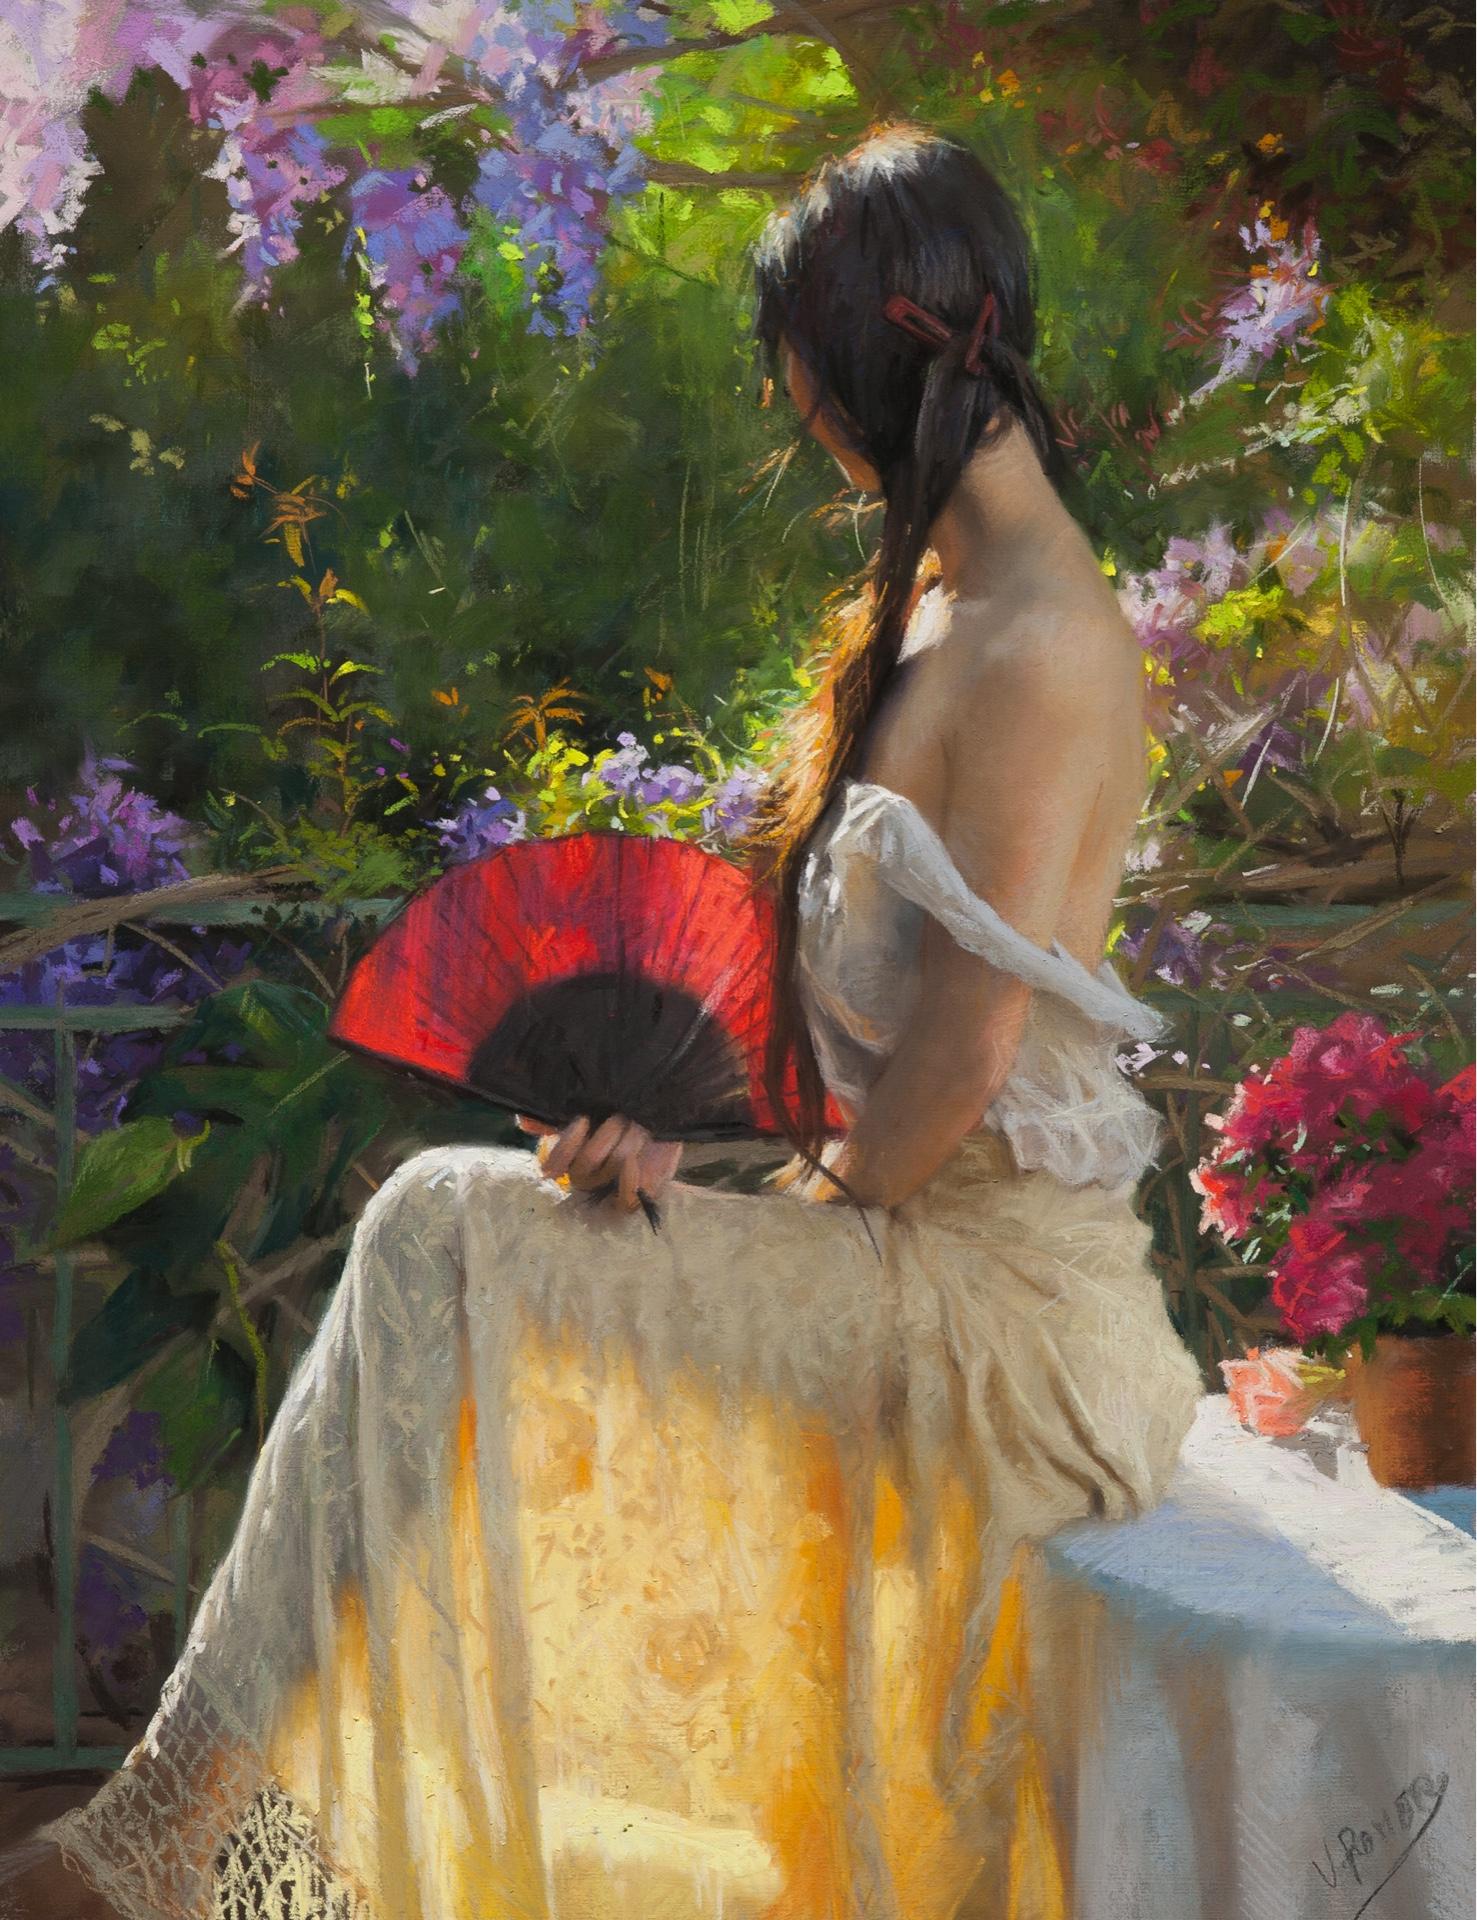 20191227-20200107 Iberian Love (Vincent Romero)